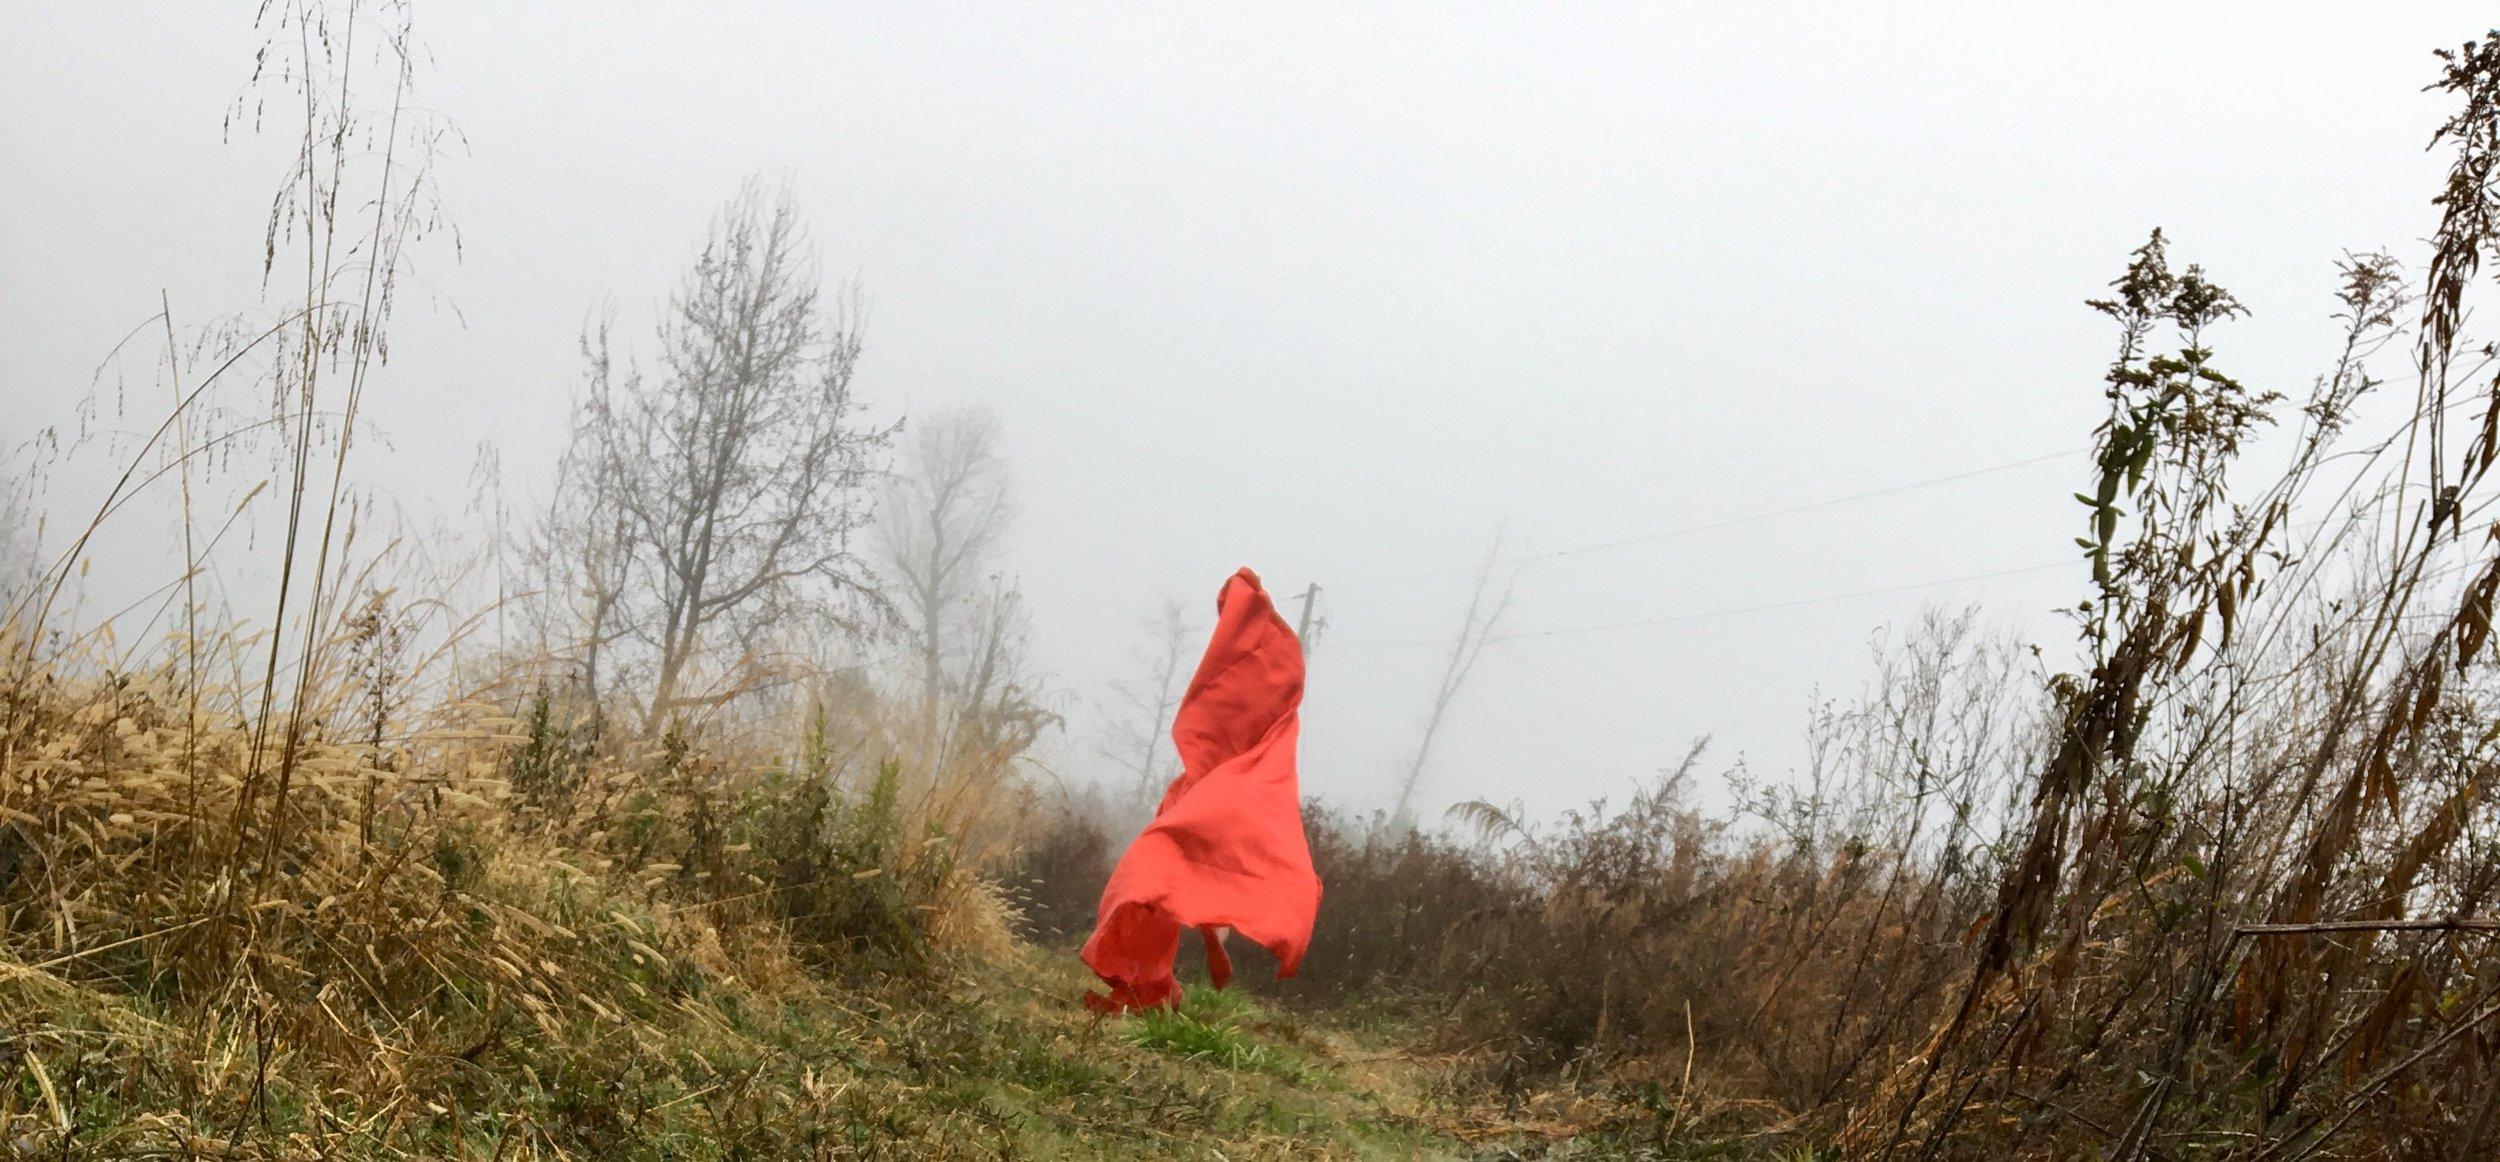 Cutting Through the Fog Like a Knife, Blountsville, AL, 2017